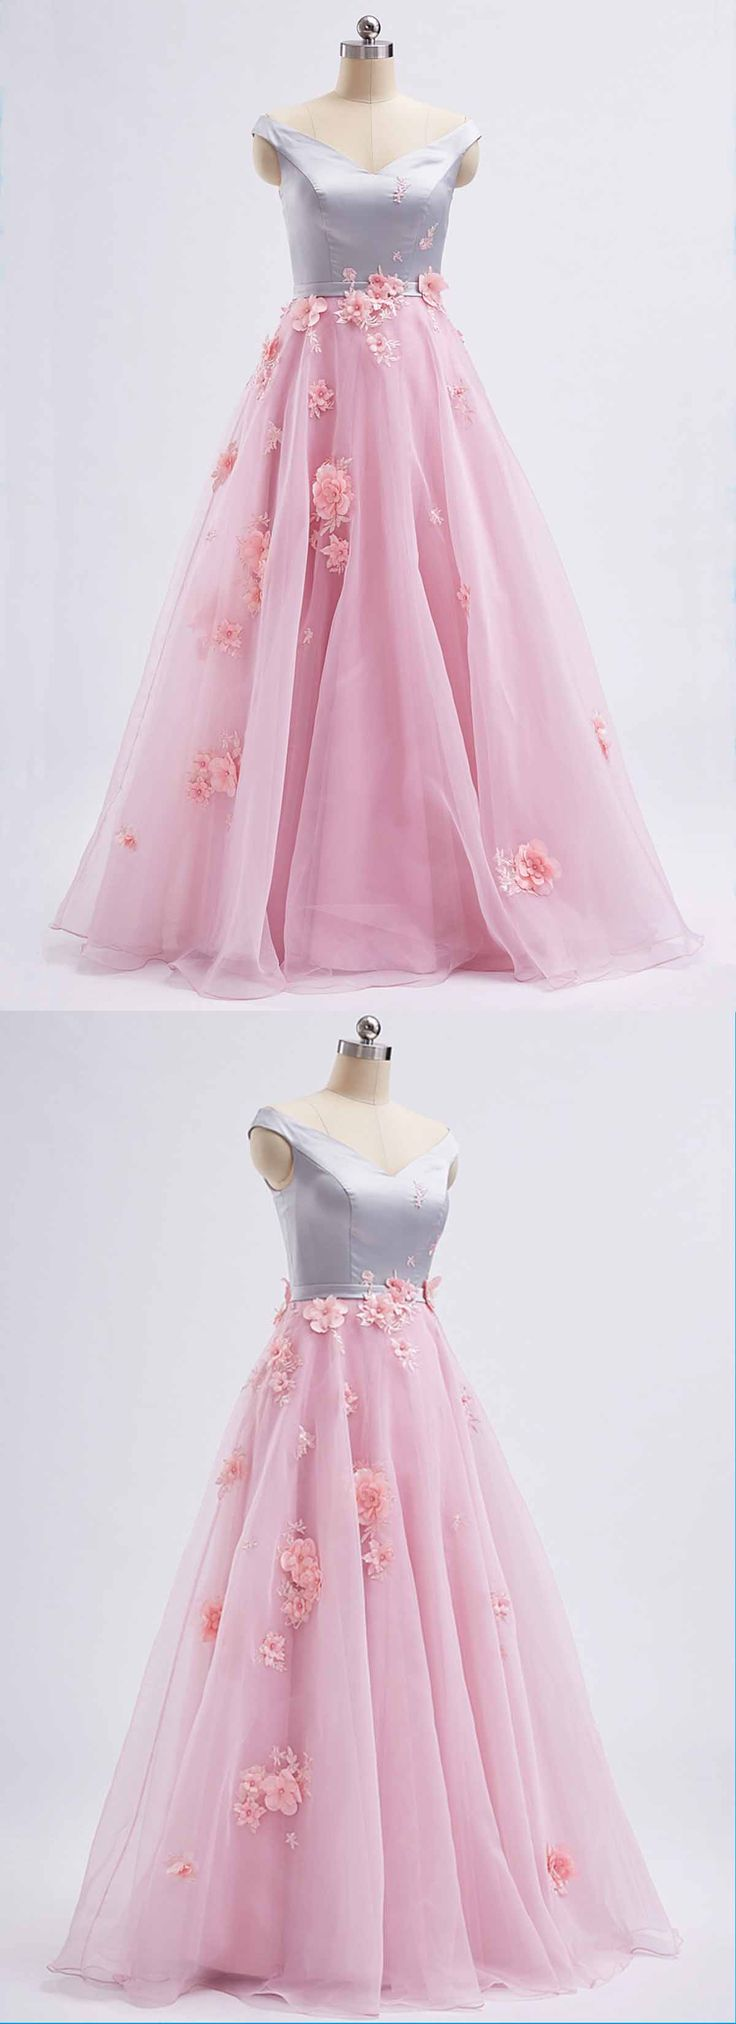 287 best Dresses: Long images on Pinterest